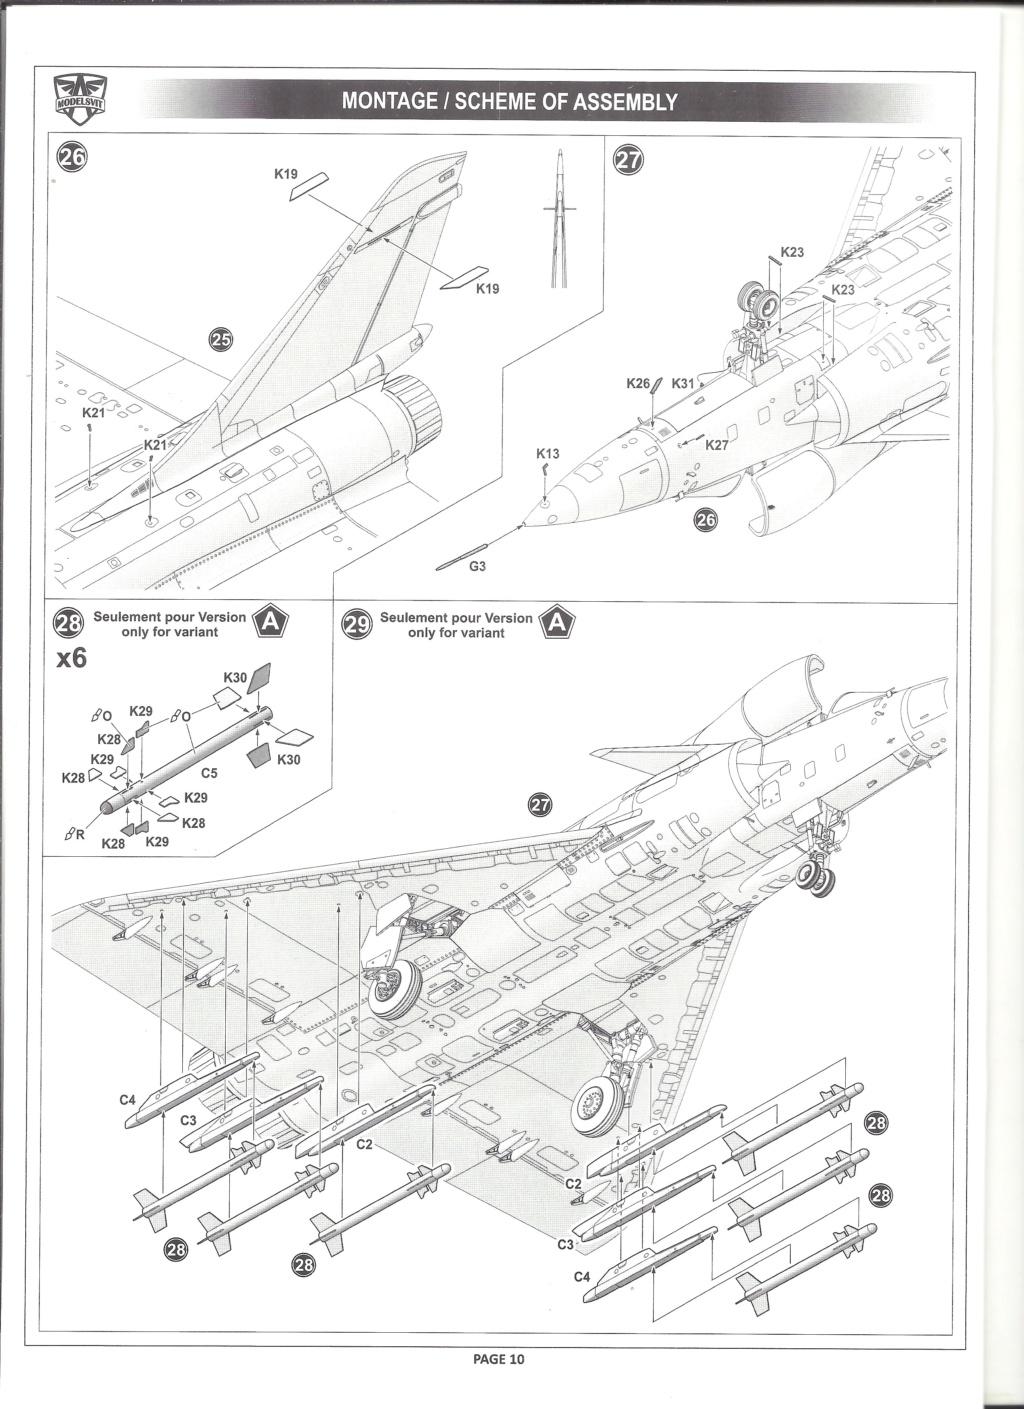 [MODELSVIT] DASSAULT MIRAGE 4000 1/72ème Réf 72052 Notice Models21